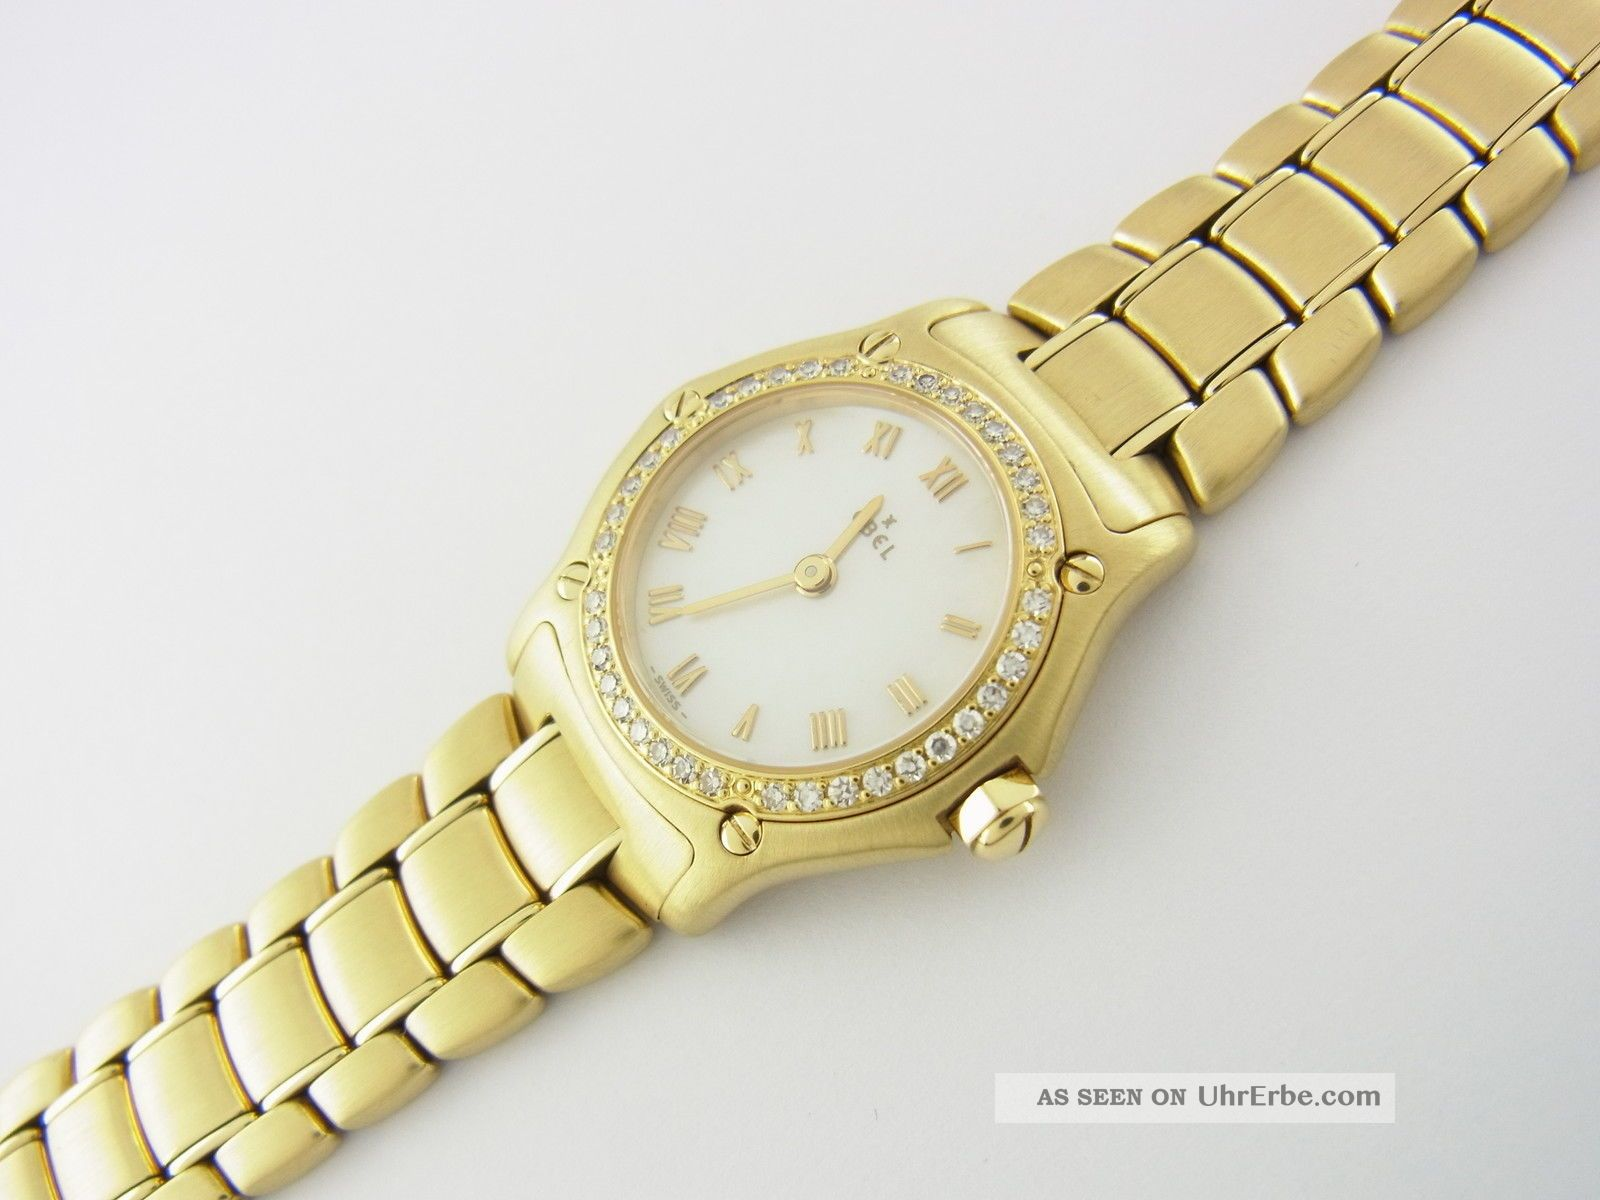 Ebel Sport Classic Damenuhr Aus 750er Gelbgold Mit Diamanten - Lünette Ref.  8057901 Armbanduhren Bild